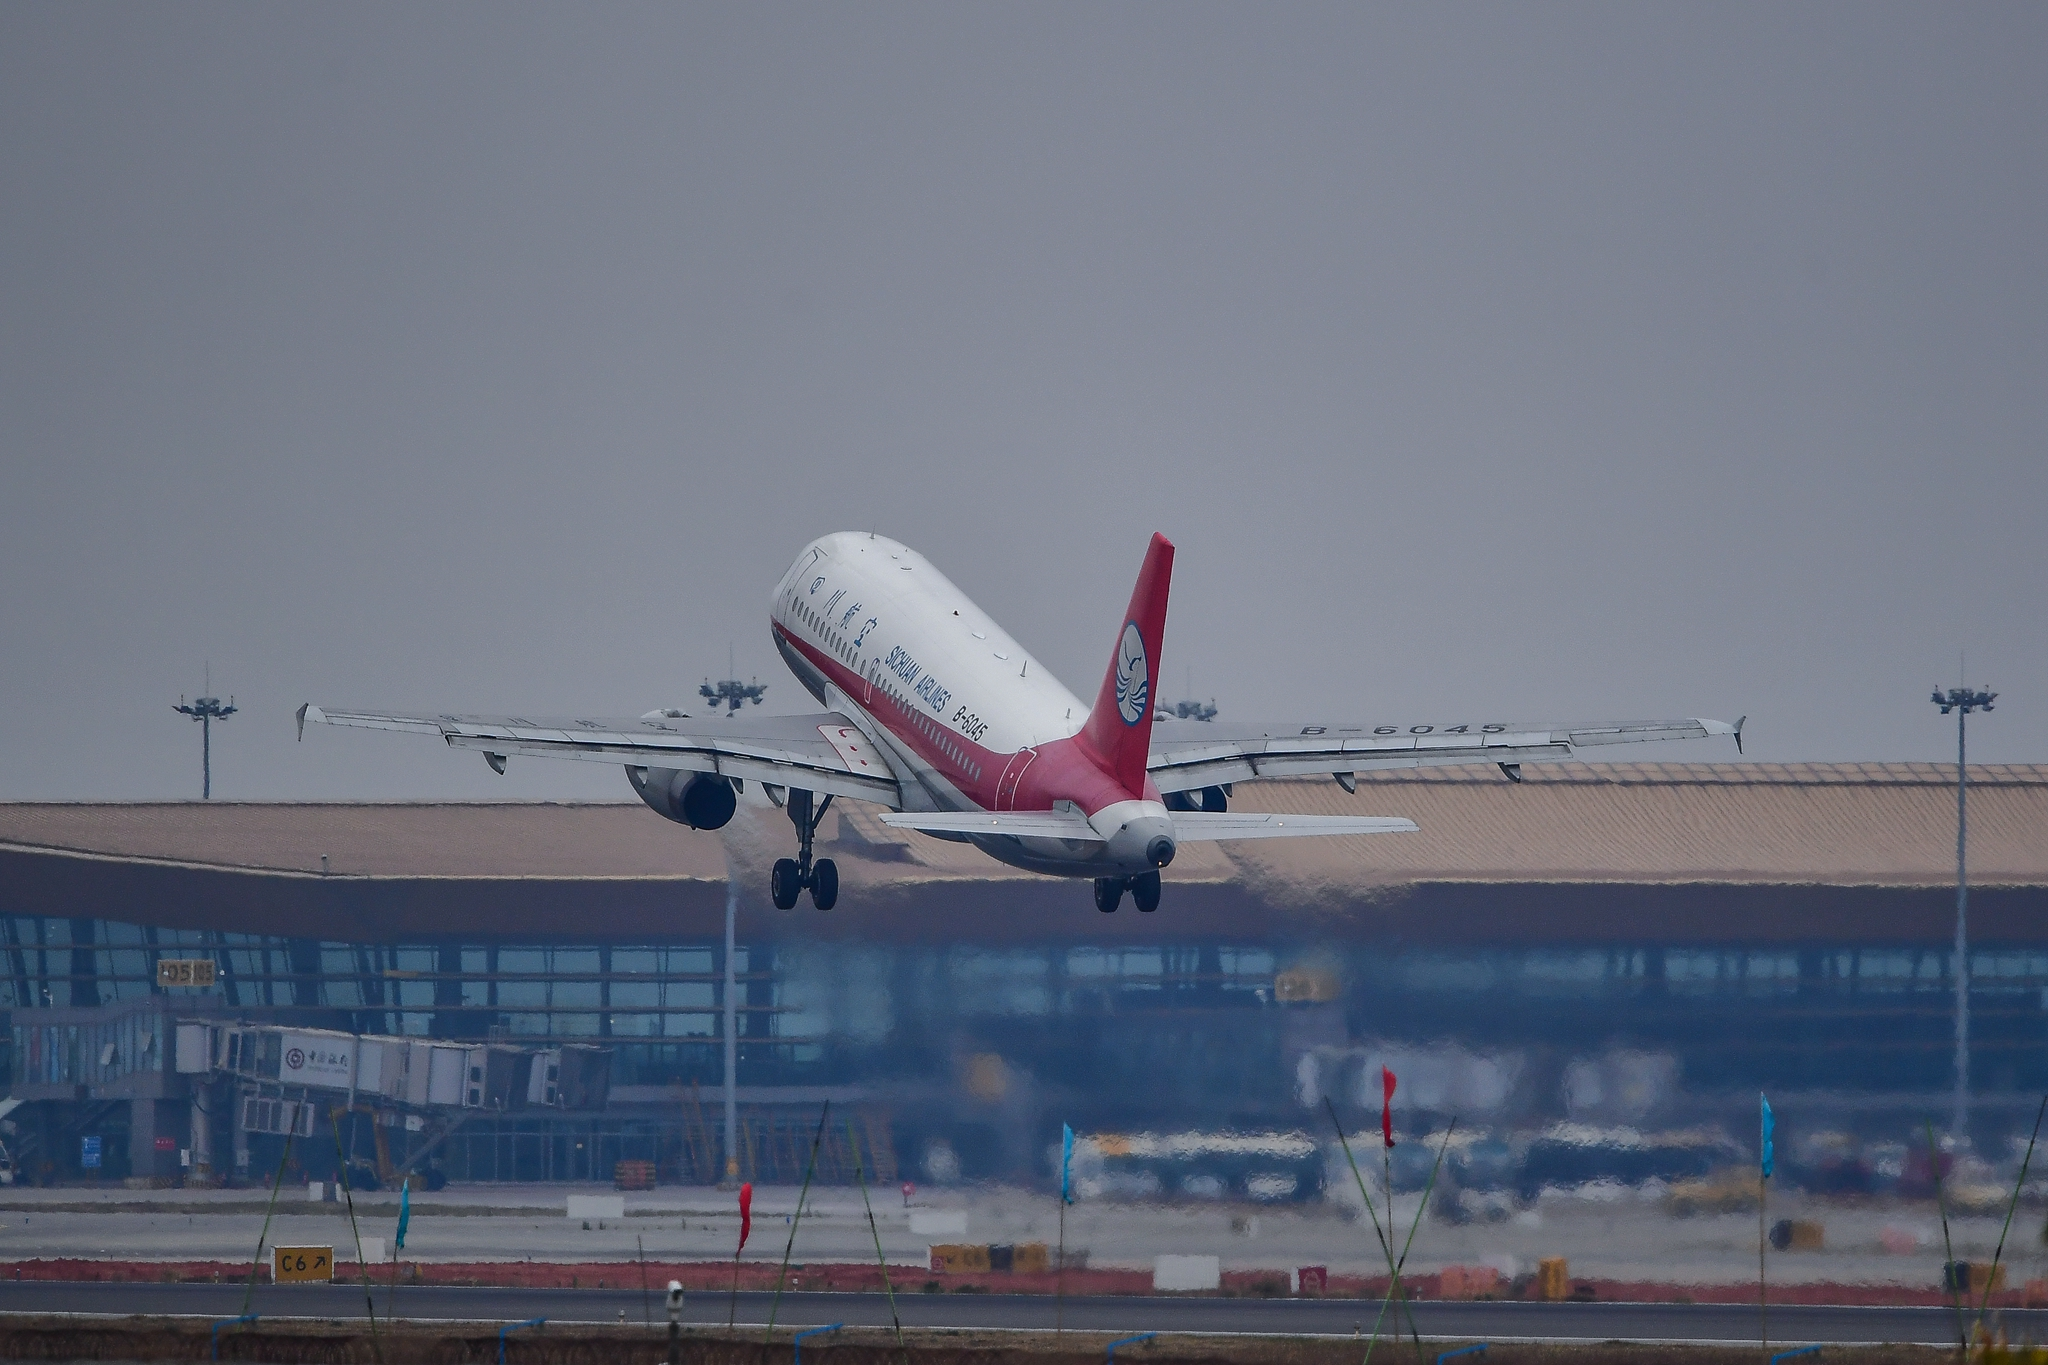 Re:[原创]KMG 庚子年初四再赴长水之约 都是似曾相识 都是熟悉的味道 AIRBUS A319-100 B-6045 中国昆明长水国际机场